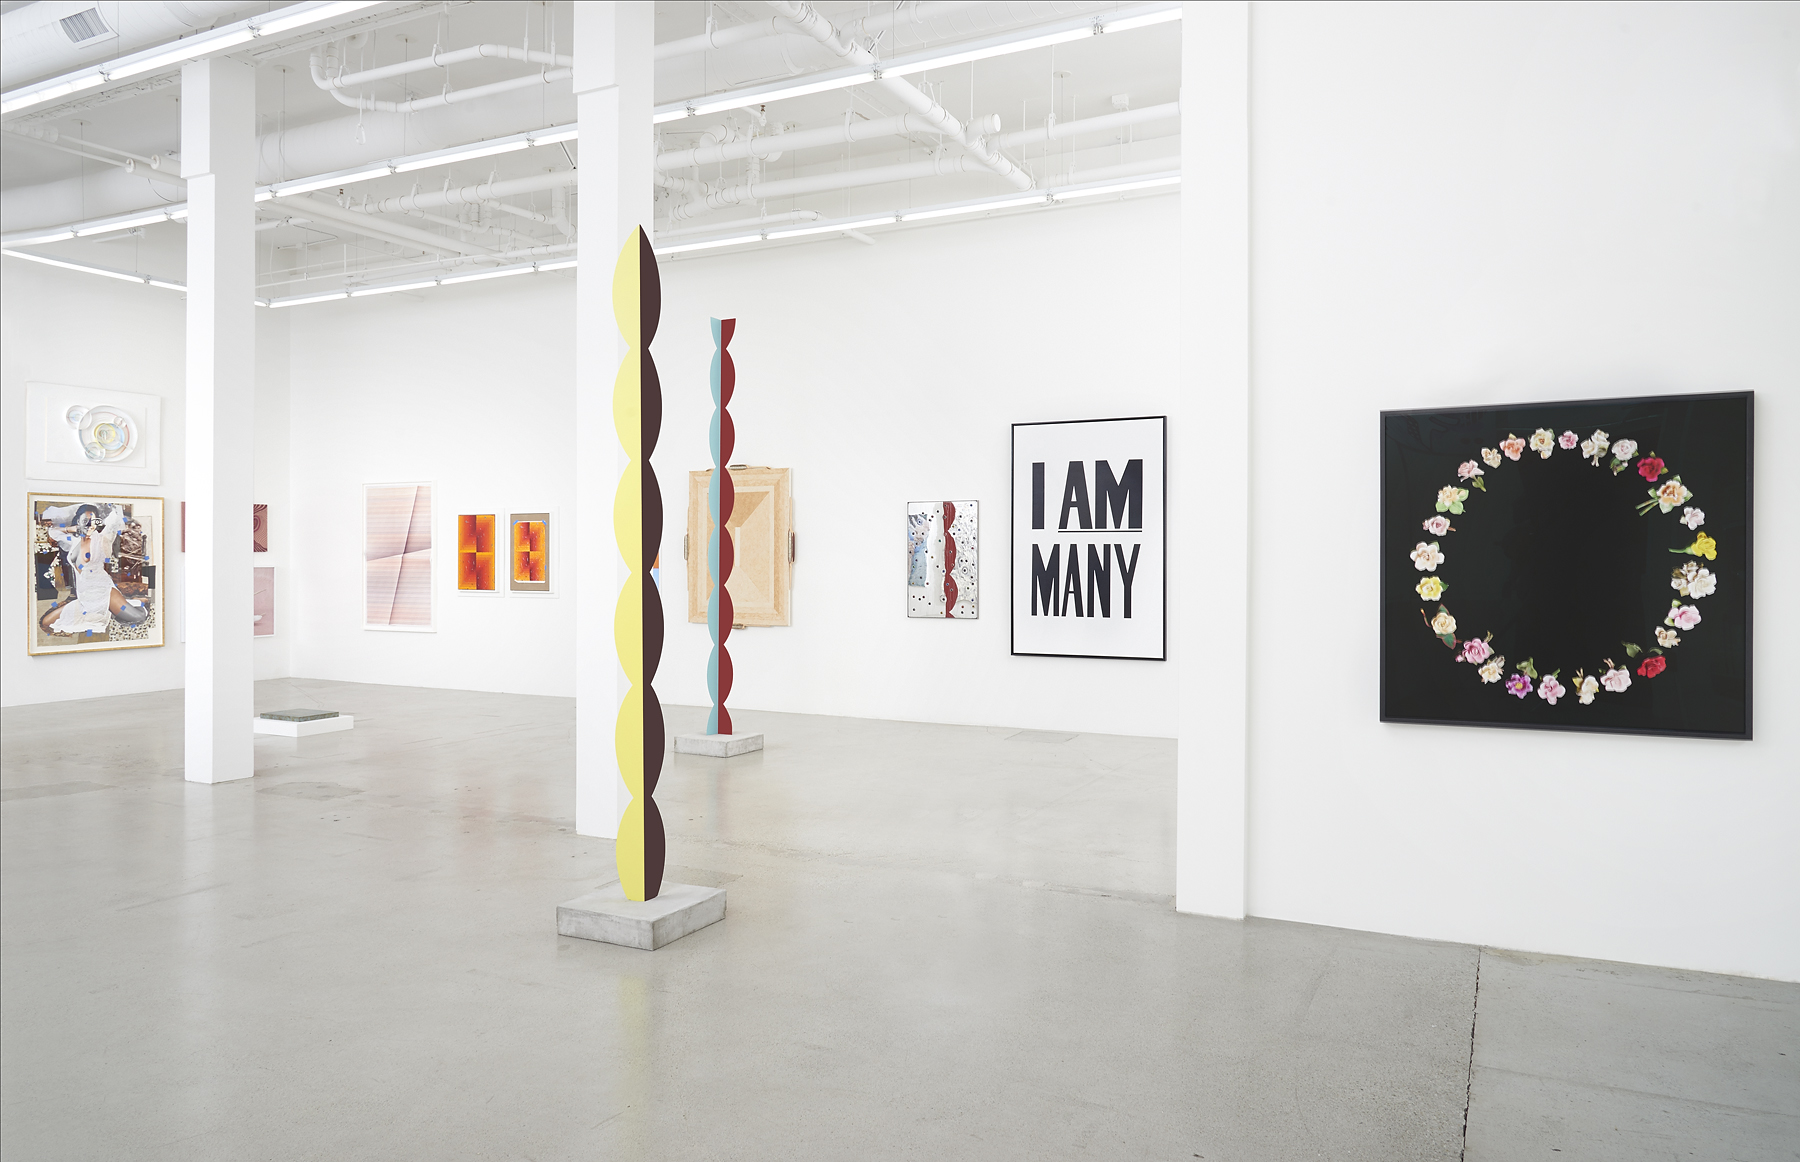 Kinship, 2018_Jessica Silverman Gallery, Installation view 11.PRS.jpg